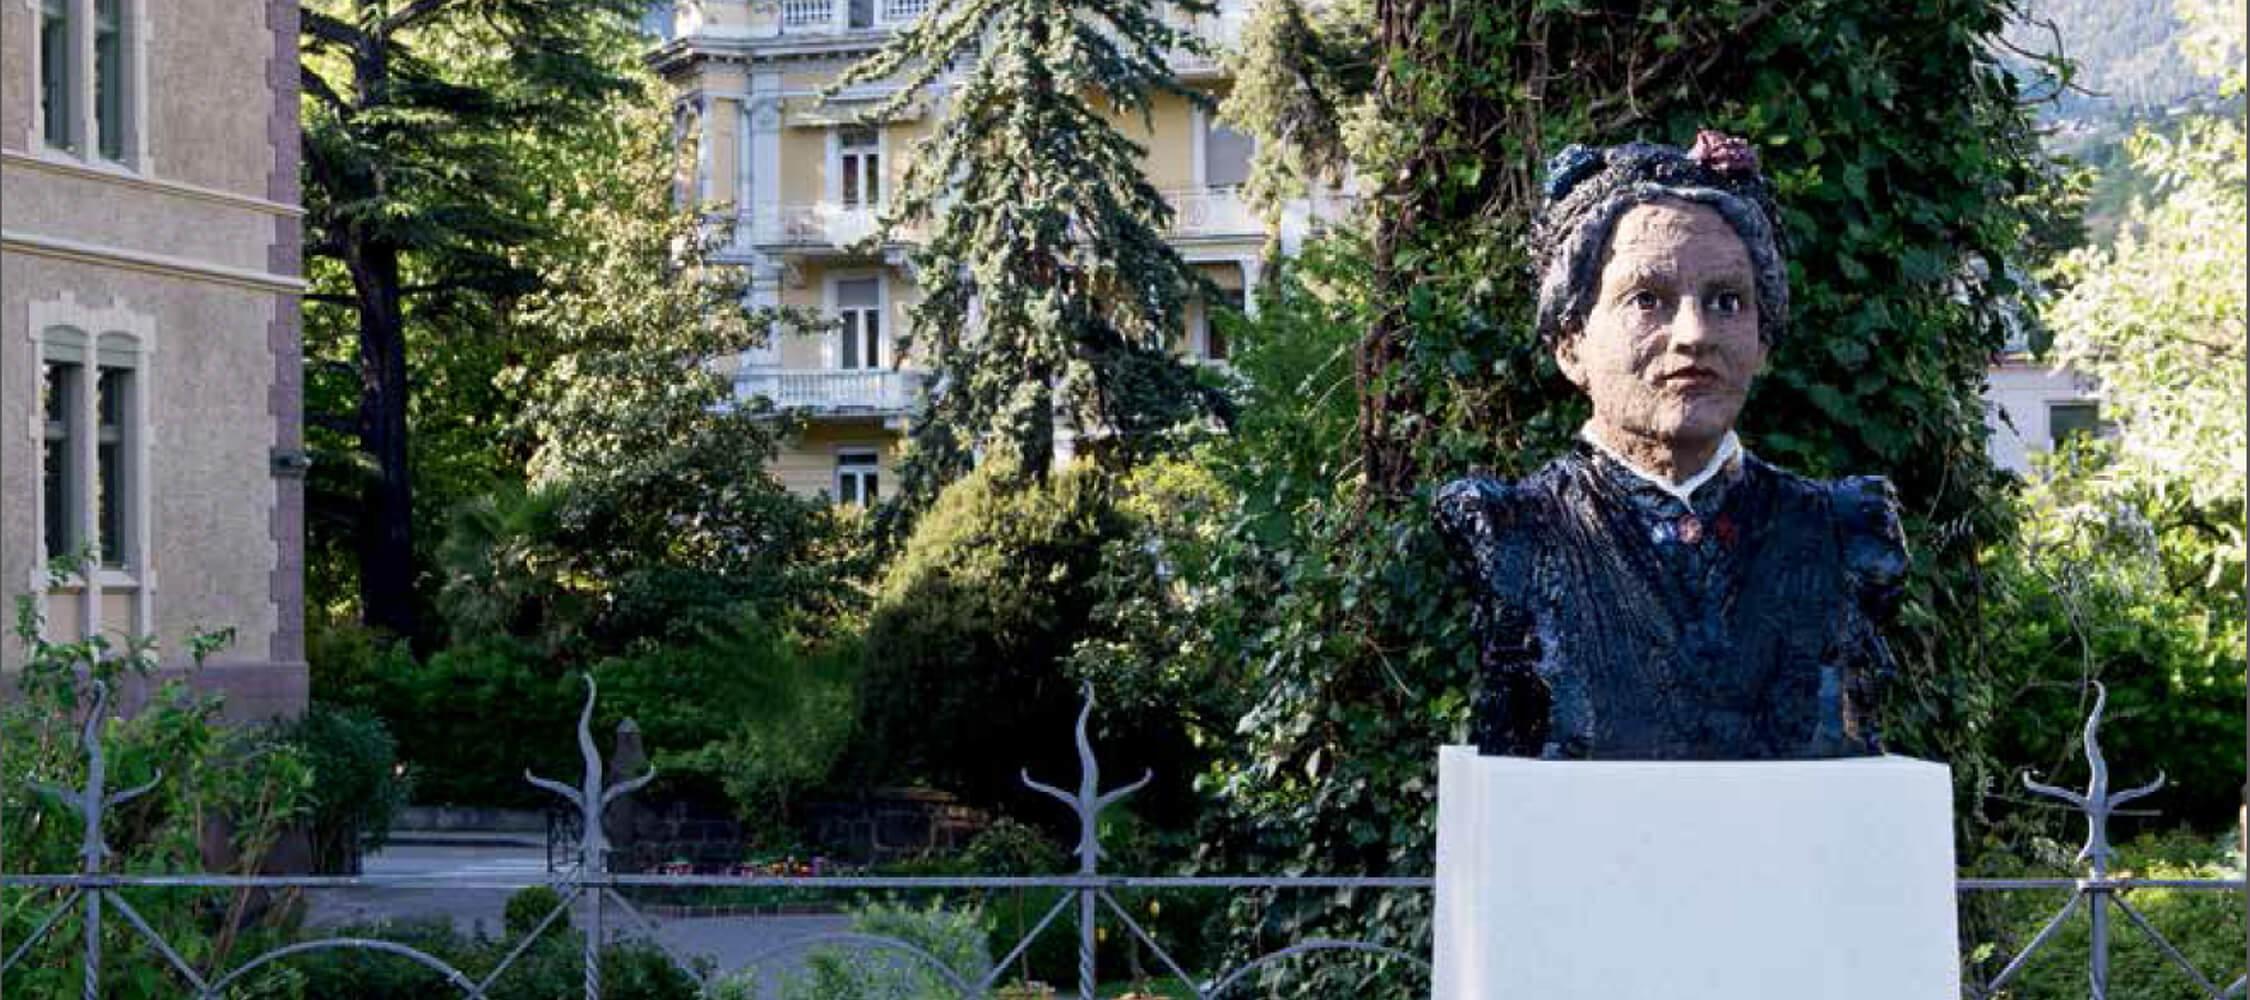 Italien-Trentino_Suedtirol_Alto_Adige_Merano_Meran_Besichtigen_Kultur_Kunst_Natur_Menschenbilder_Touriseum_2250x1000